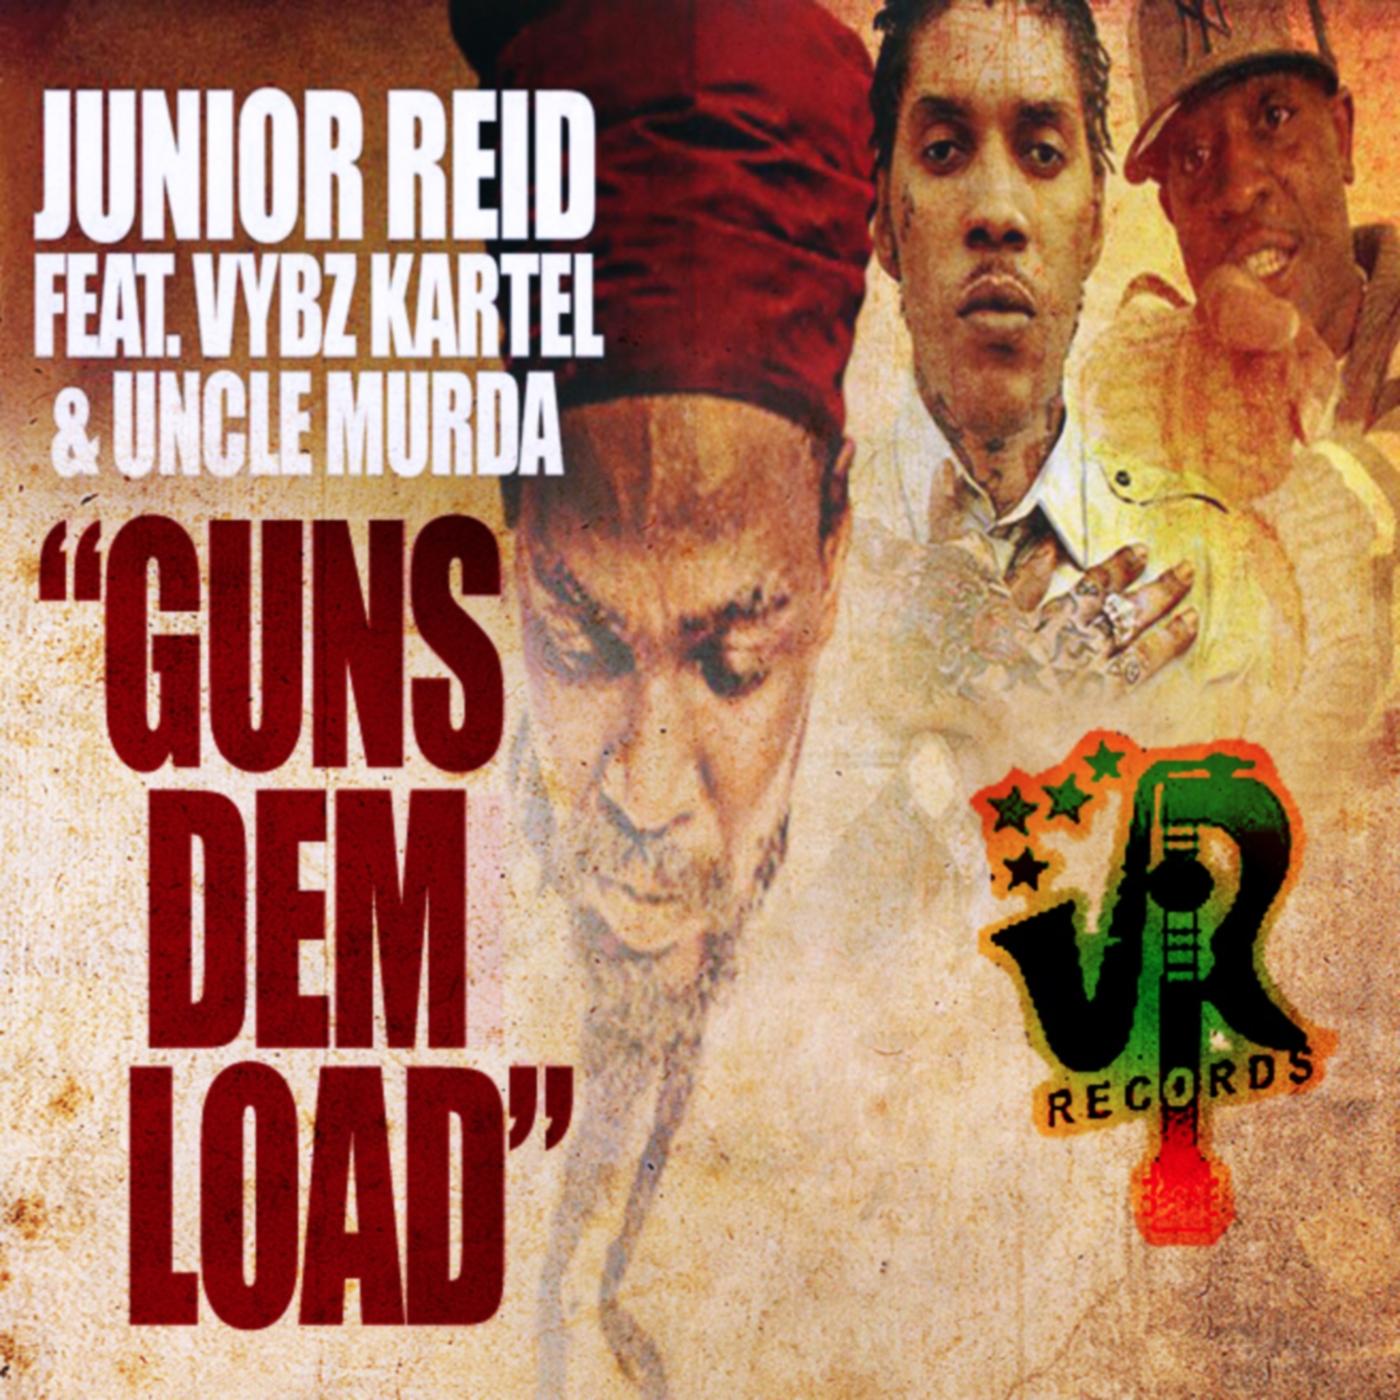 JUNIOR REID FT VYBZ KARTEL & UNCLE MURDA – GUNS DEM LOAD (RAW & CLEAN) – VR RECORDS